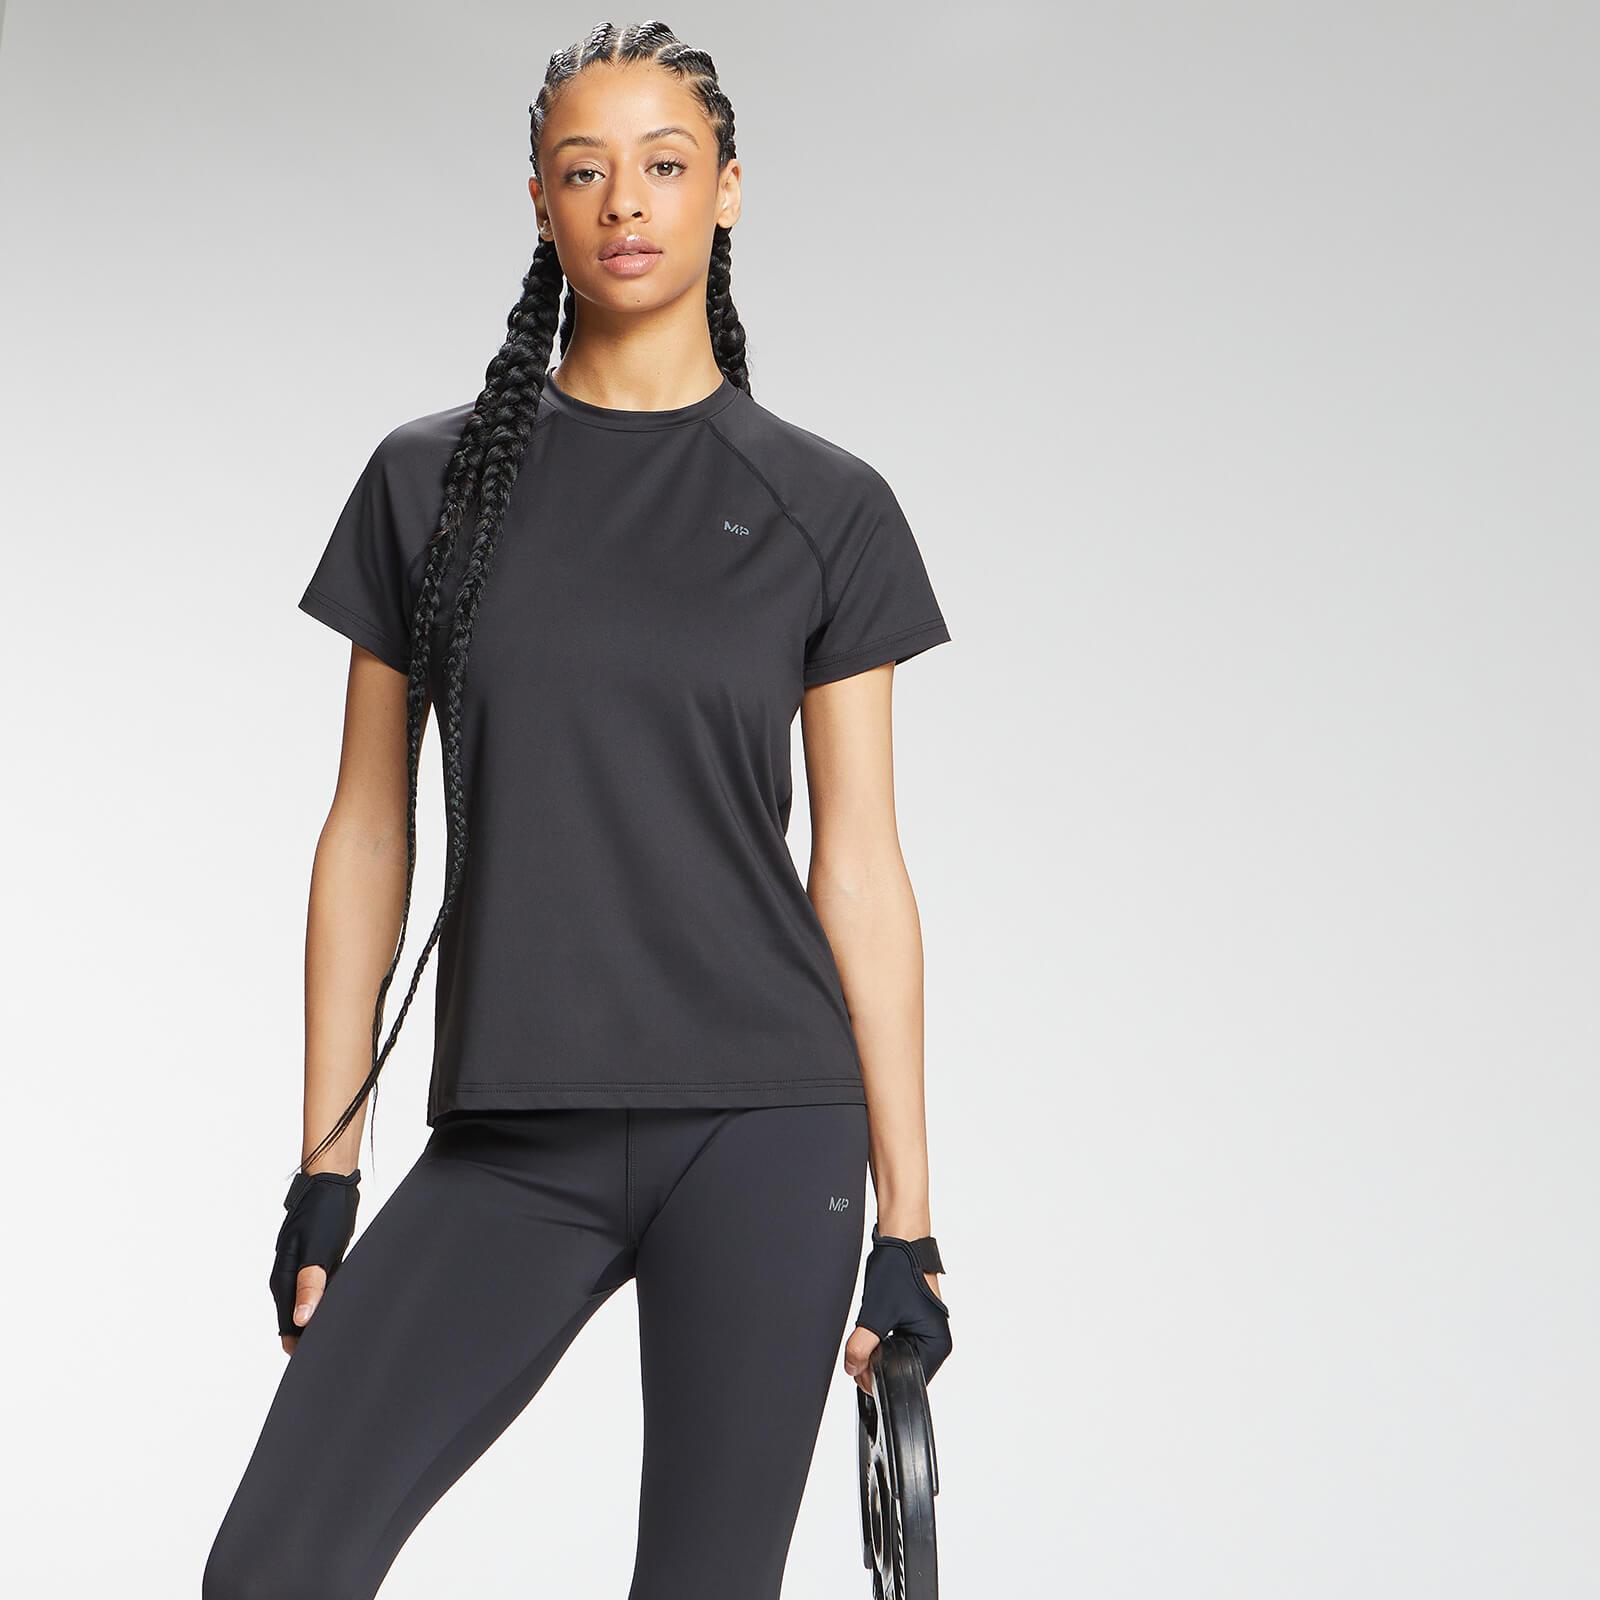 Купить MP Women's Repeat MP Training T-Shirt - Black - XXS, Myprotein International